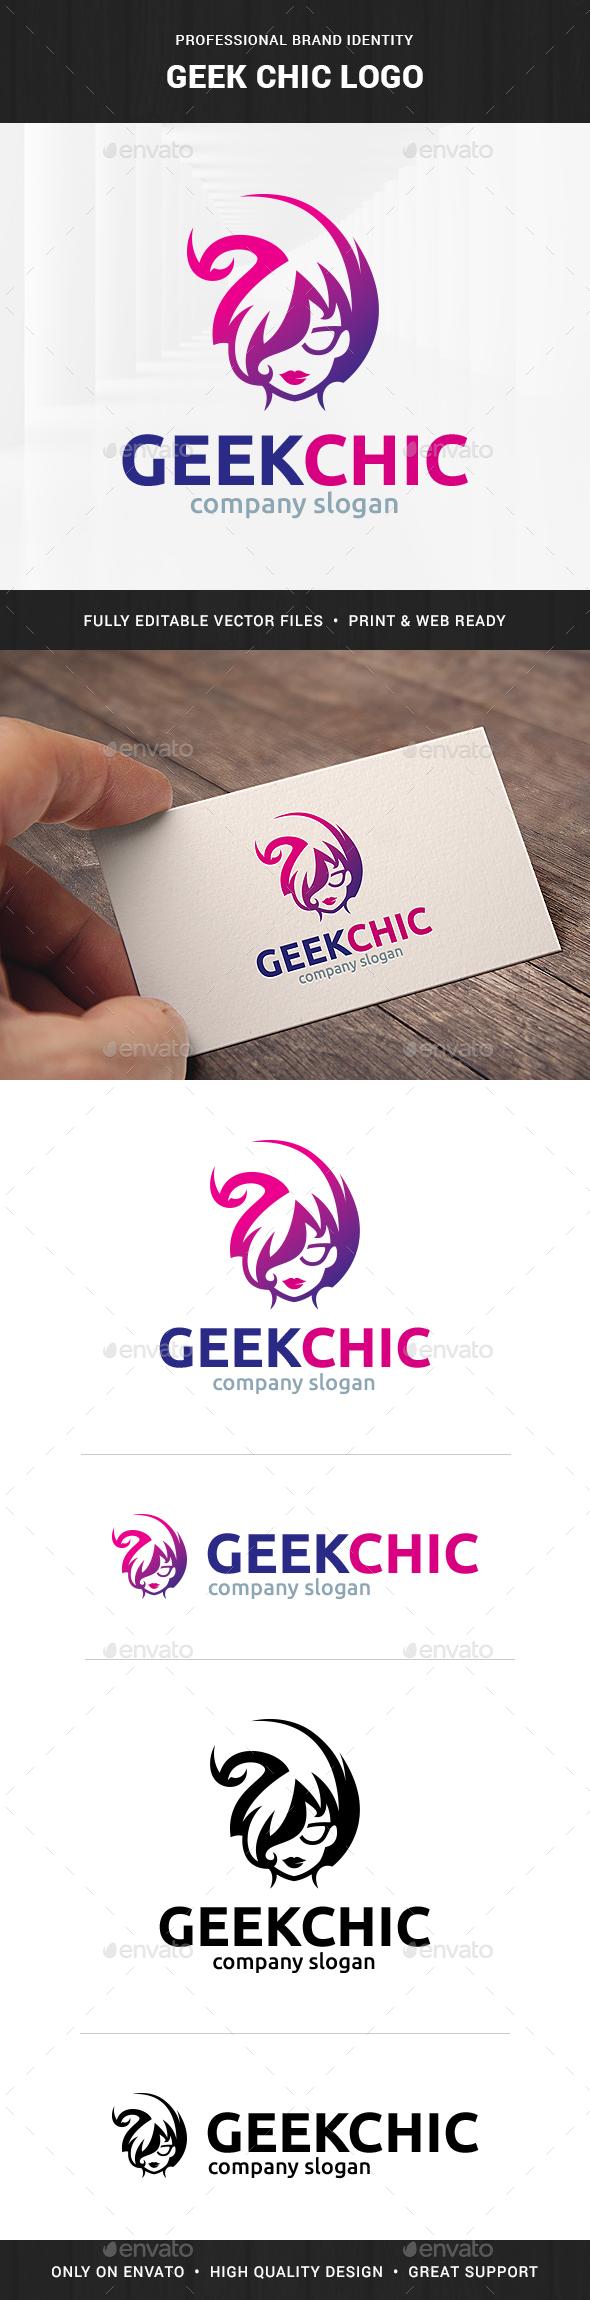 Geek Chic Logo Template